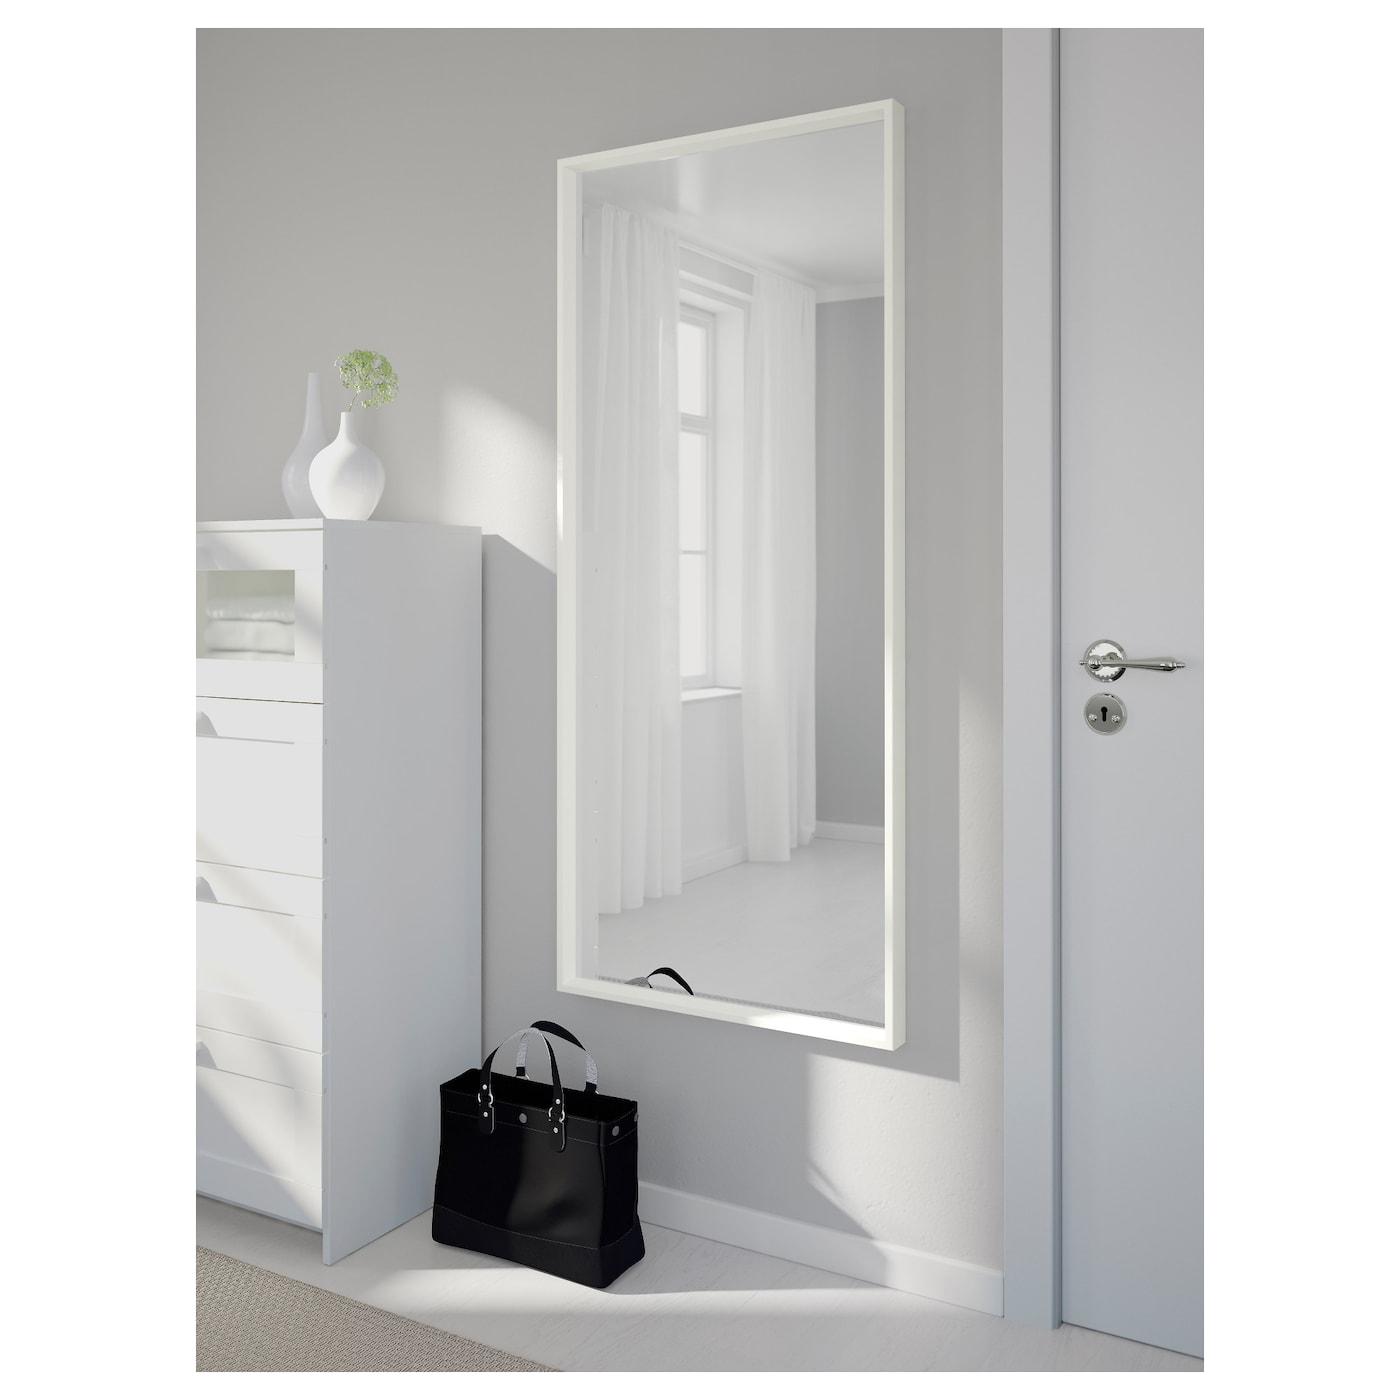 Nissedal Espejo Blanco 65 X 150 Cm Ikea